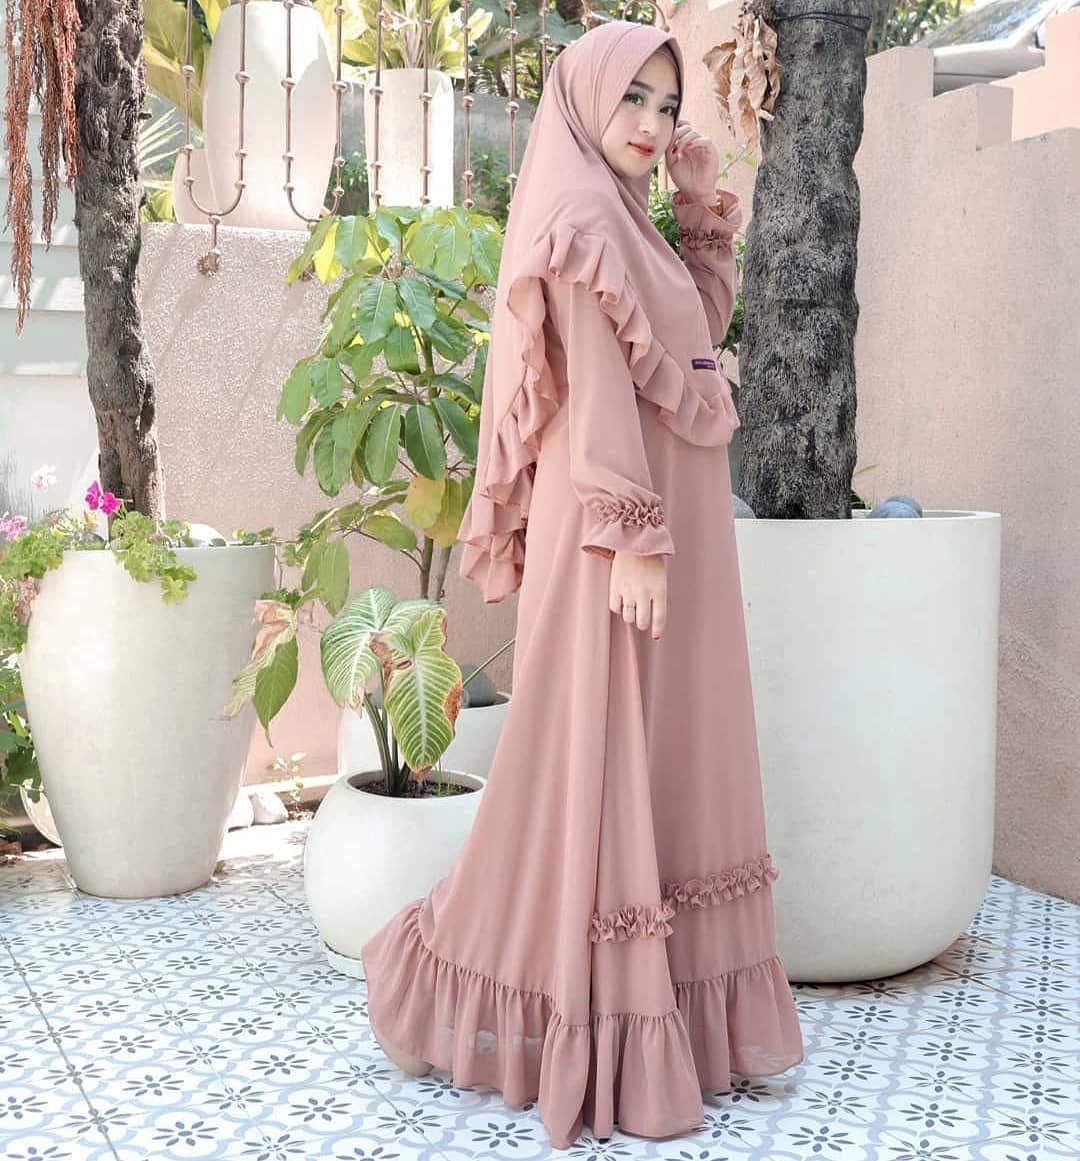 😍😍😍❤❤❤ Assalamumu'alaikum.wr.wb. Follow @putri_meilani5 . Like & Follow ya kaka😍😘... . .  #hijab #creative #tips #good #instagood #instagram #viral #insta #instafood #cantik #fans #bidadari #nice #palembang #instamood #indonesia #hijabers #instalove #instapic #aceh #instafollow #hijaber #best #love #bandung #instalike #beautiful #cute #selfie #like